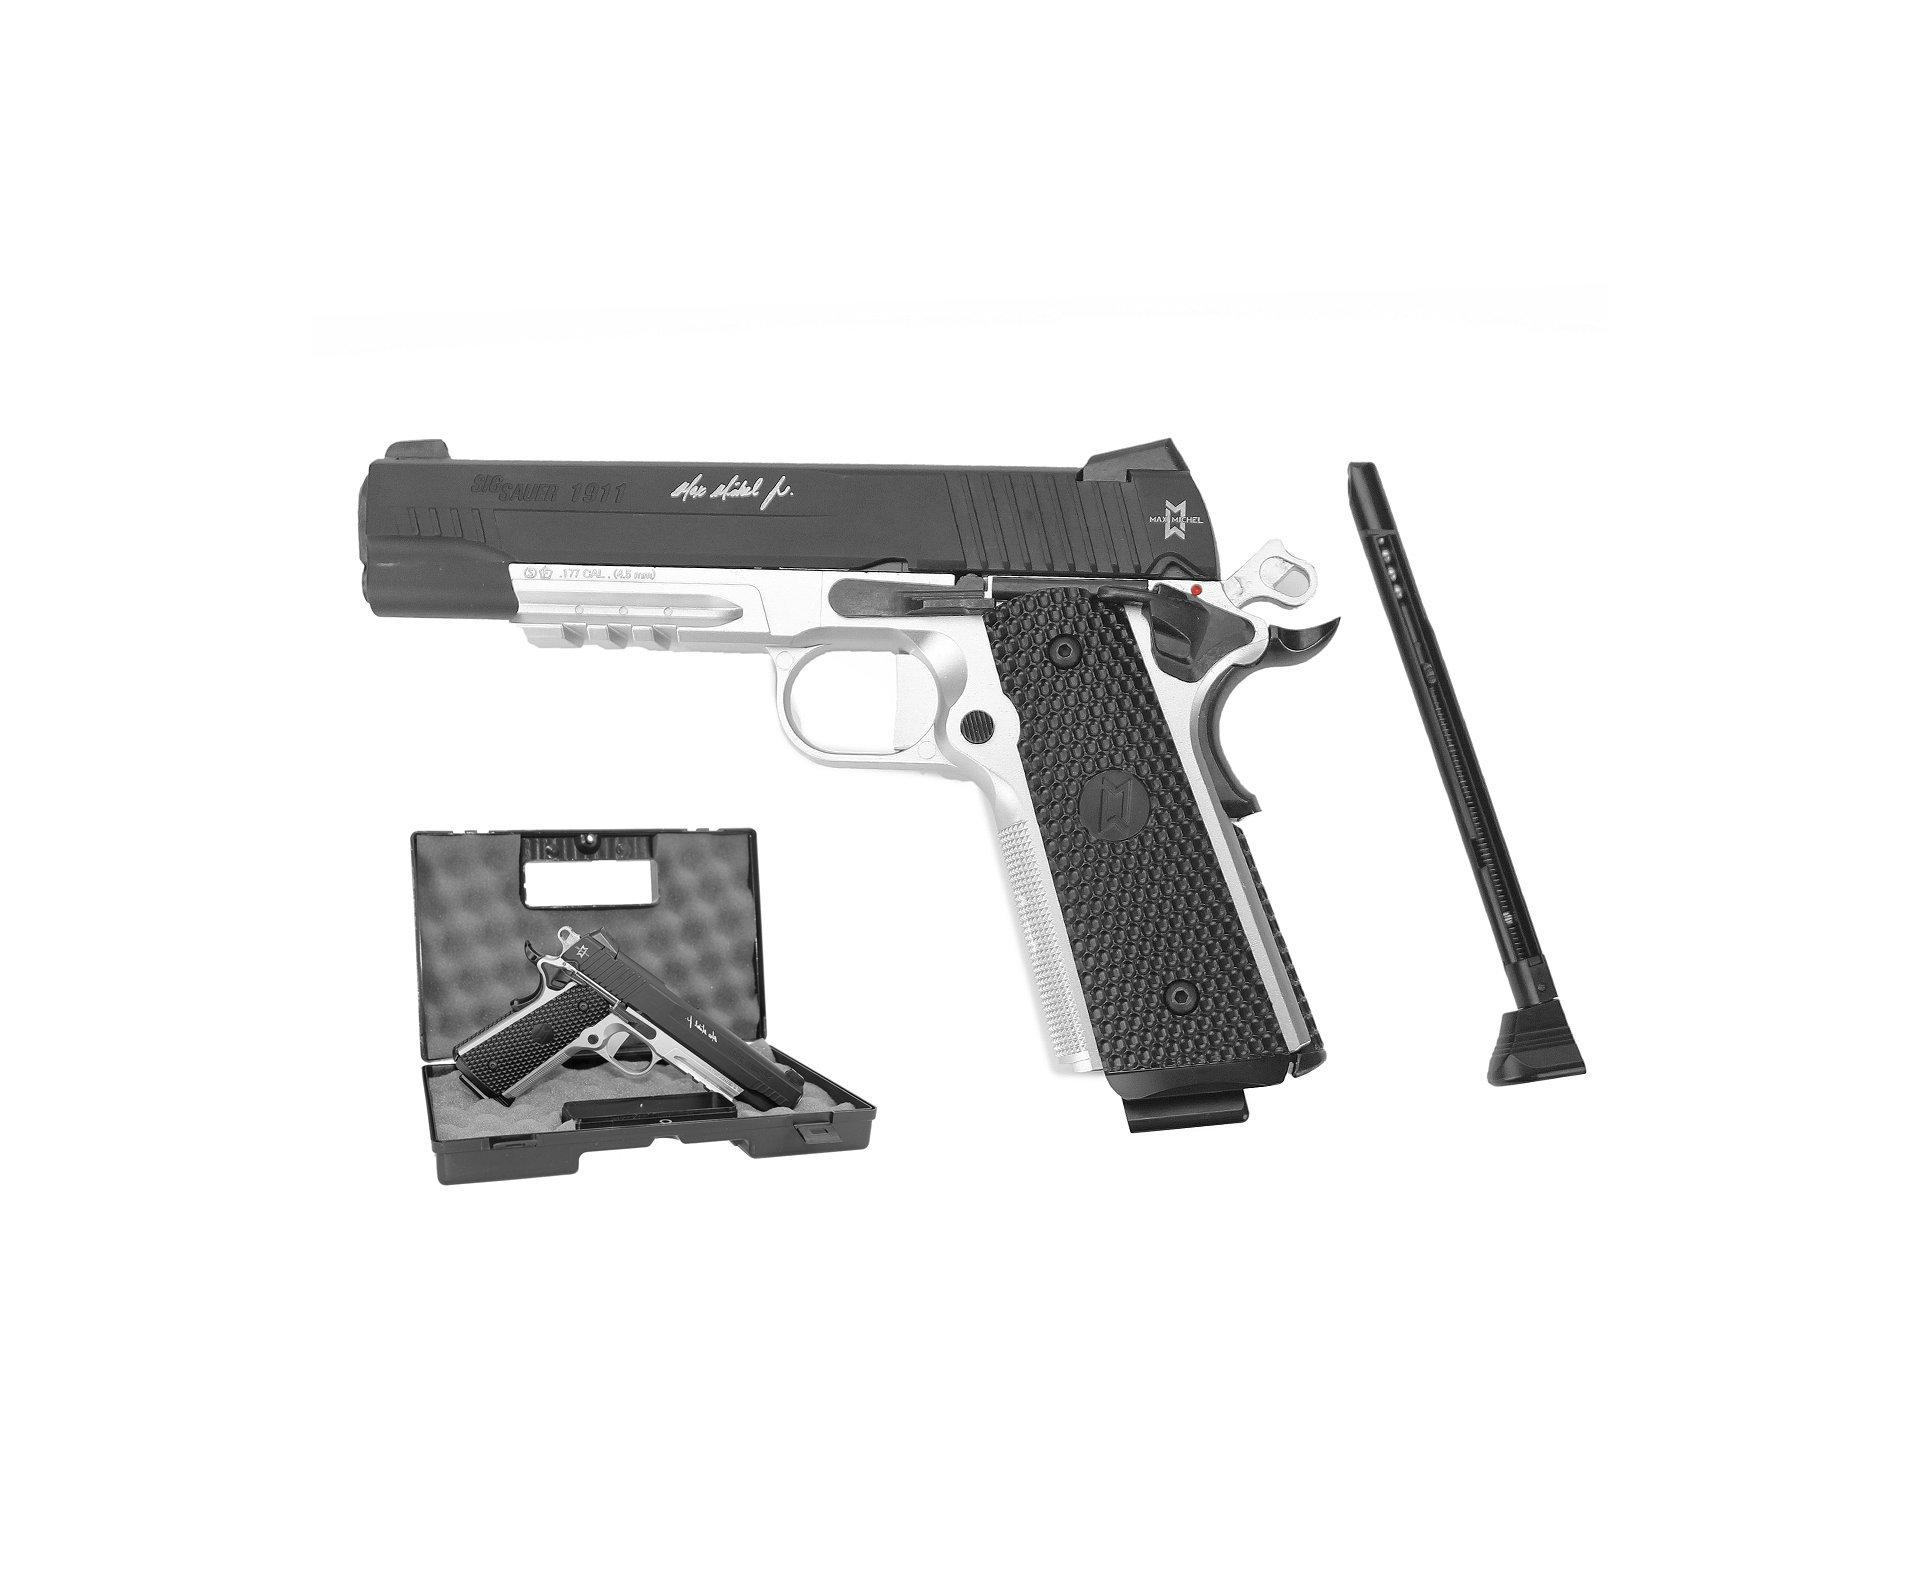 Pistola Pressão Sig Sauer 1911 Co2  Esferas De Aço 4,5mm